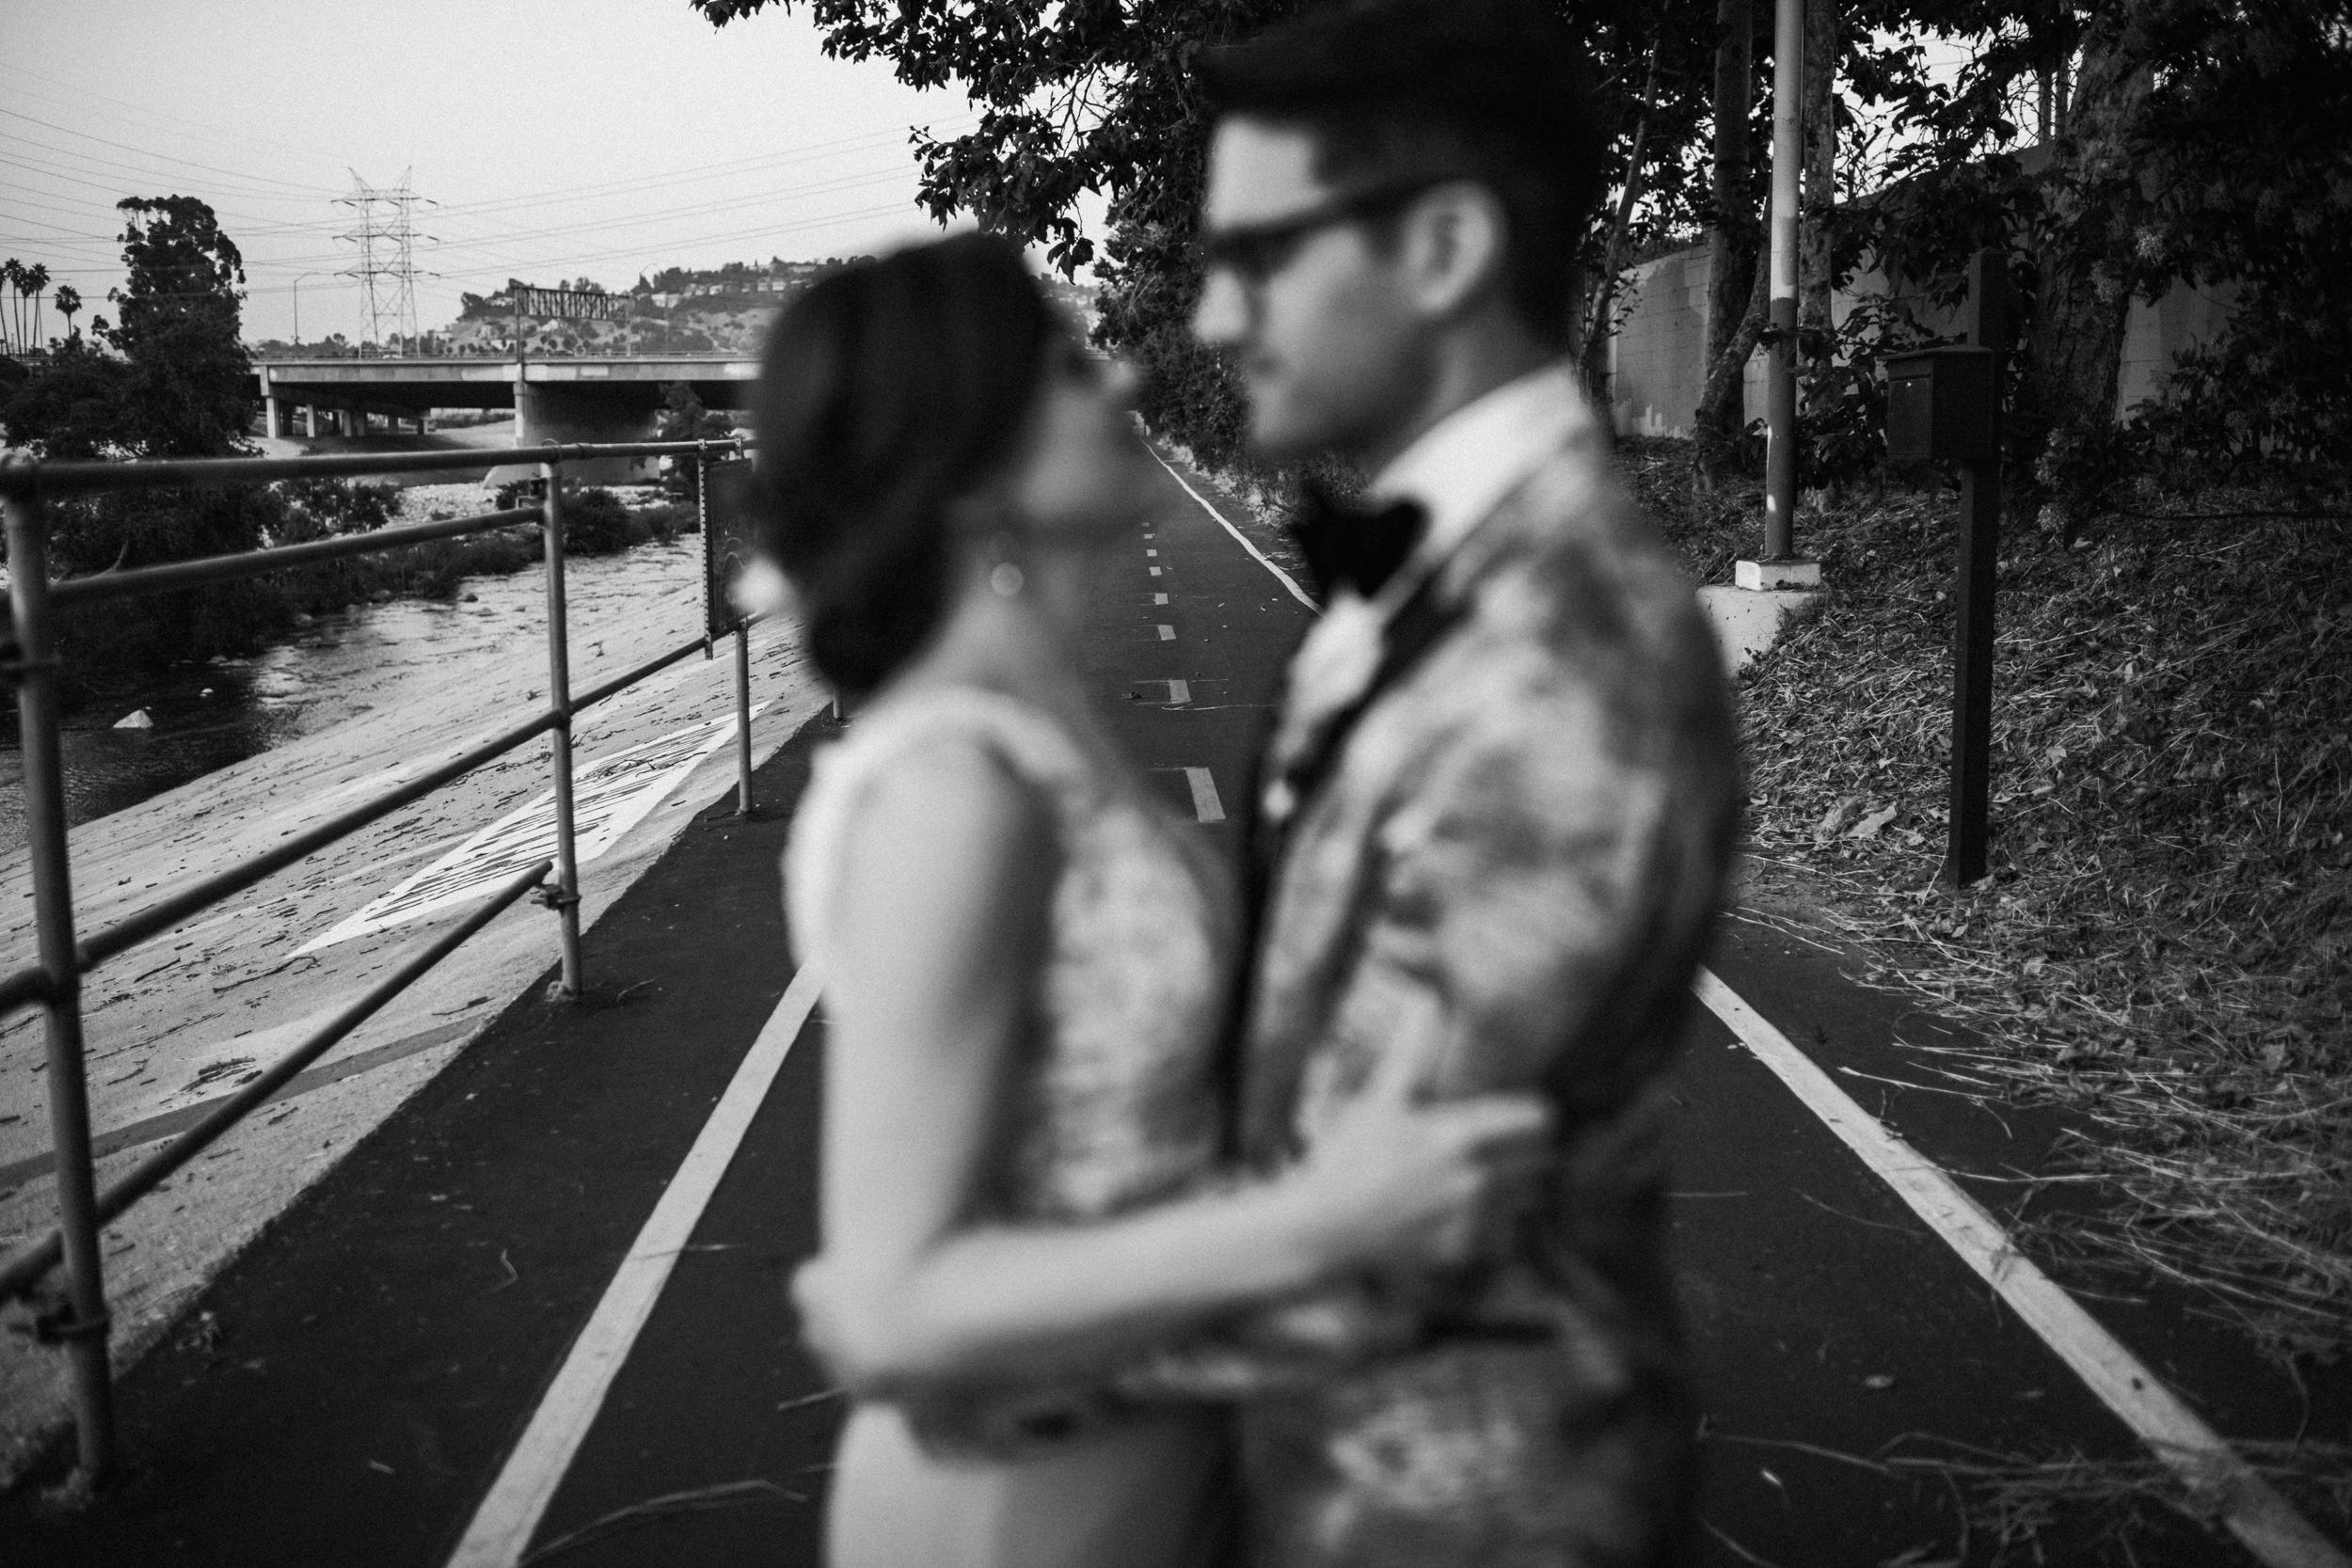 wedding_millwick_los_angeles-45.jpg